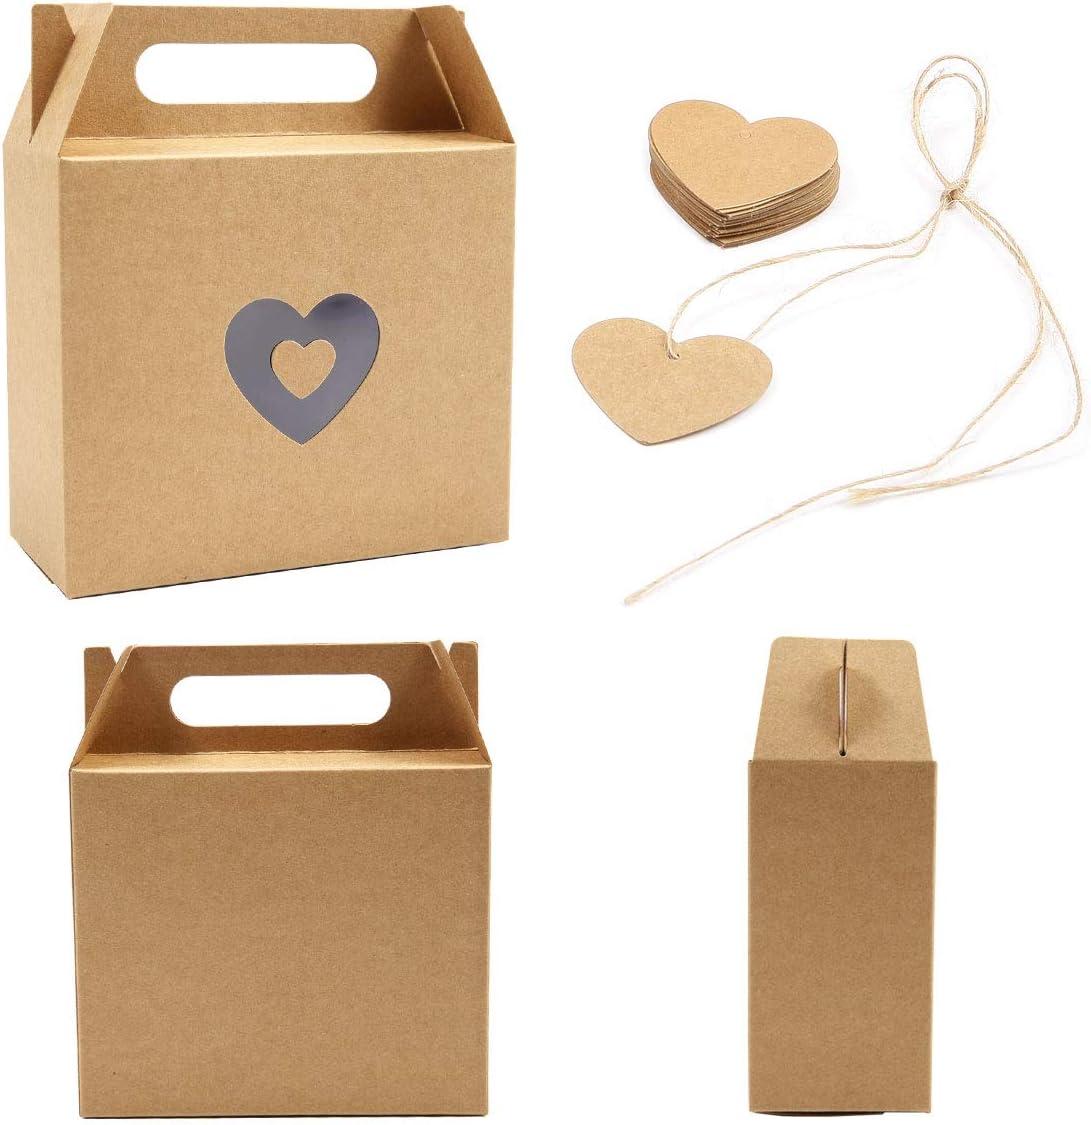 bolsas creativas con cord/ón de yute y etiquetas de coraz/ón dulces cumplea/ños SurePromise Kraft Paper Box One Heart 25 cajas de regalo de papel kraft para bodas fiestas